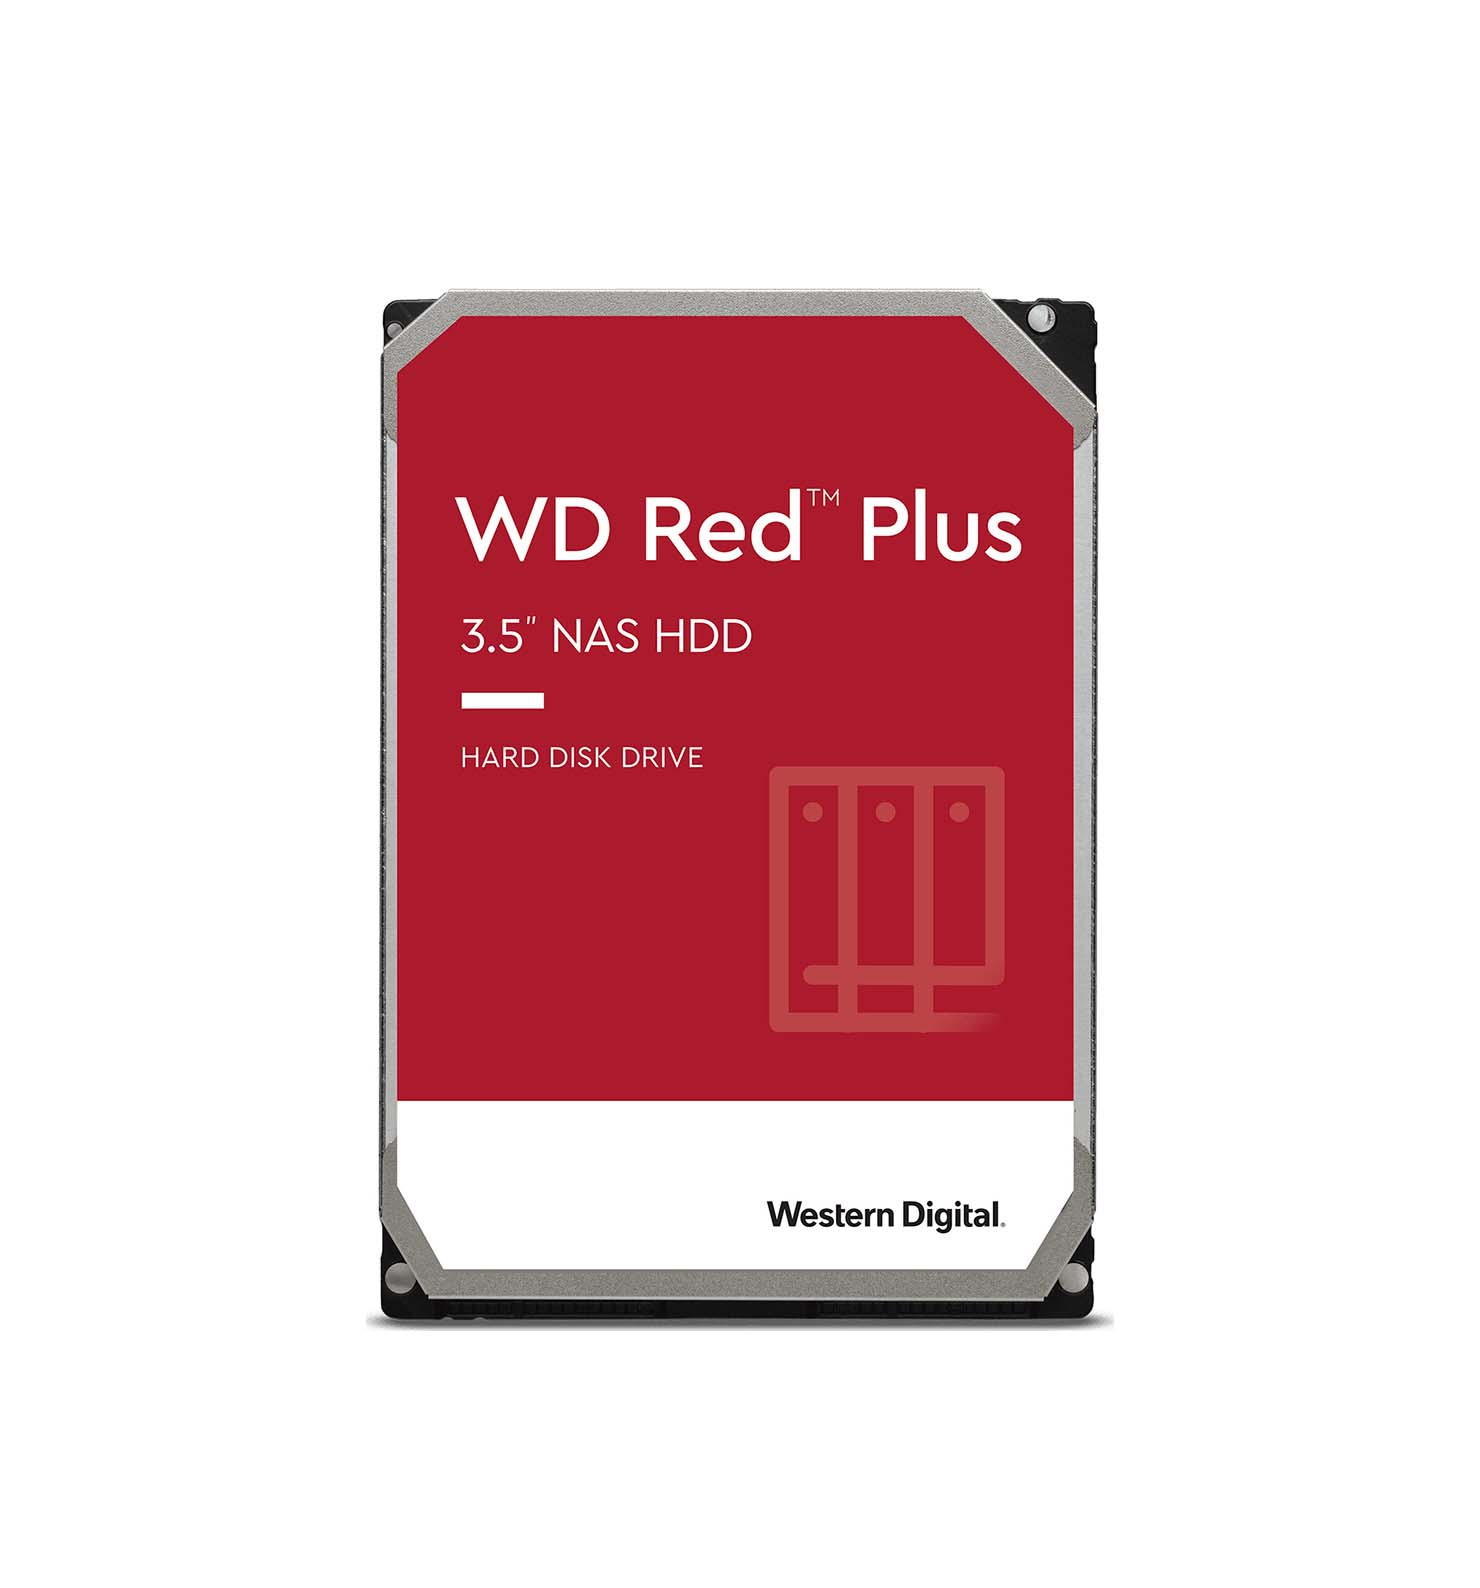 Western Digital Red Plus 4TB WD40EFZX Σκληρός Δίσκος 3.5'' Sata 3